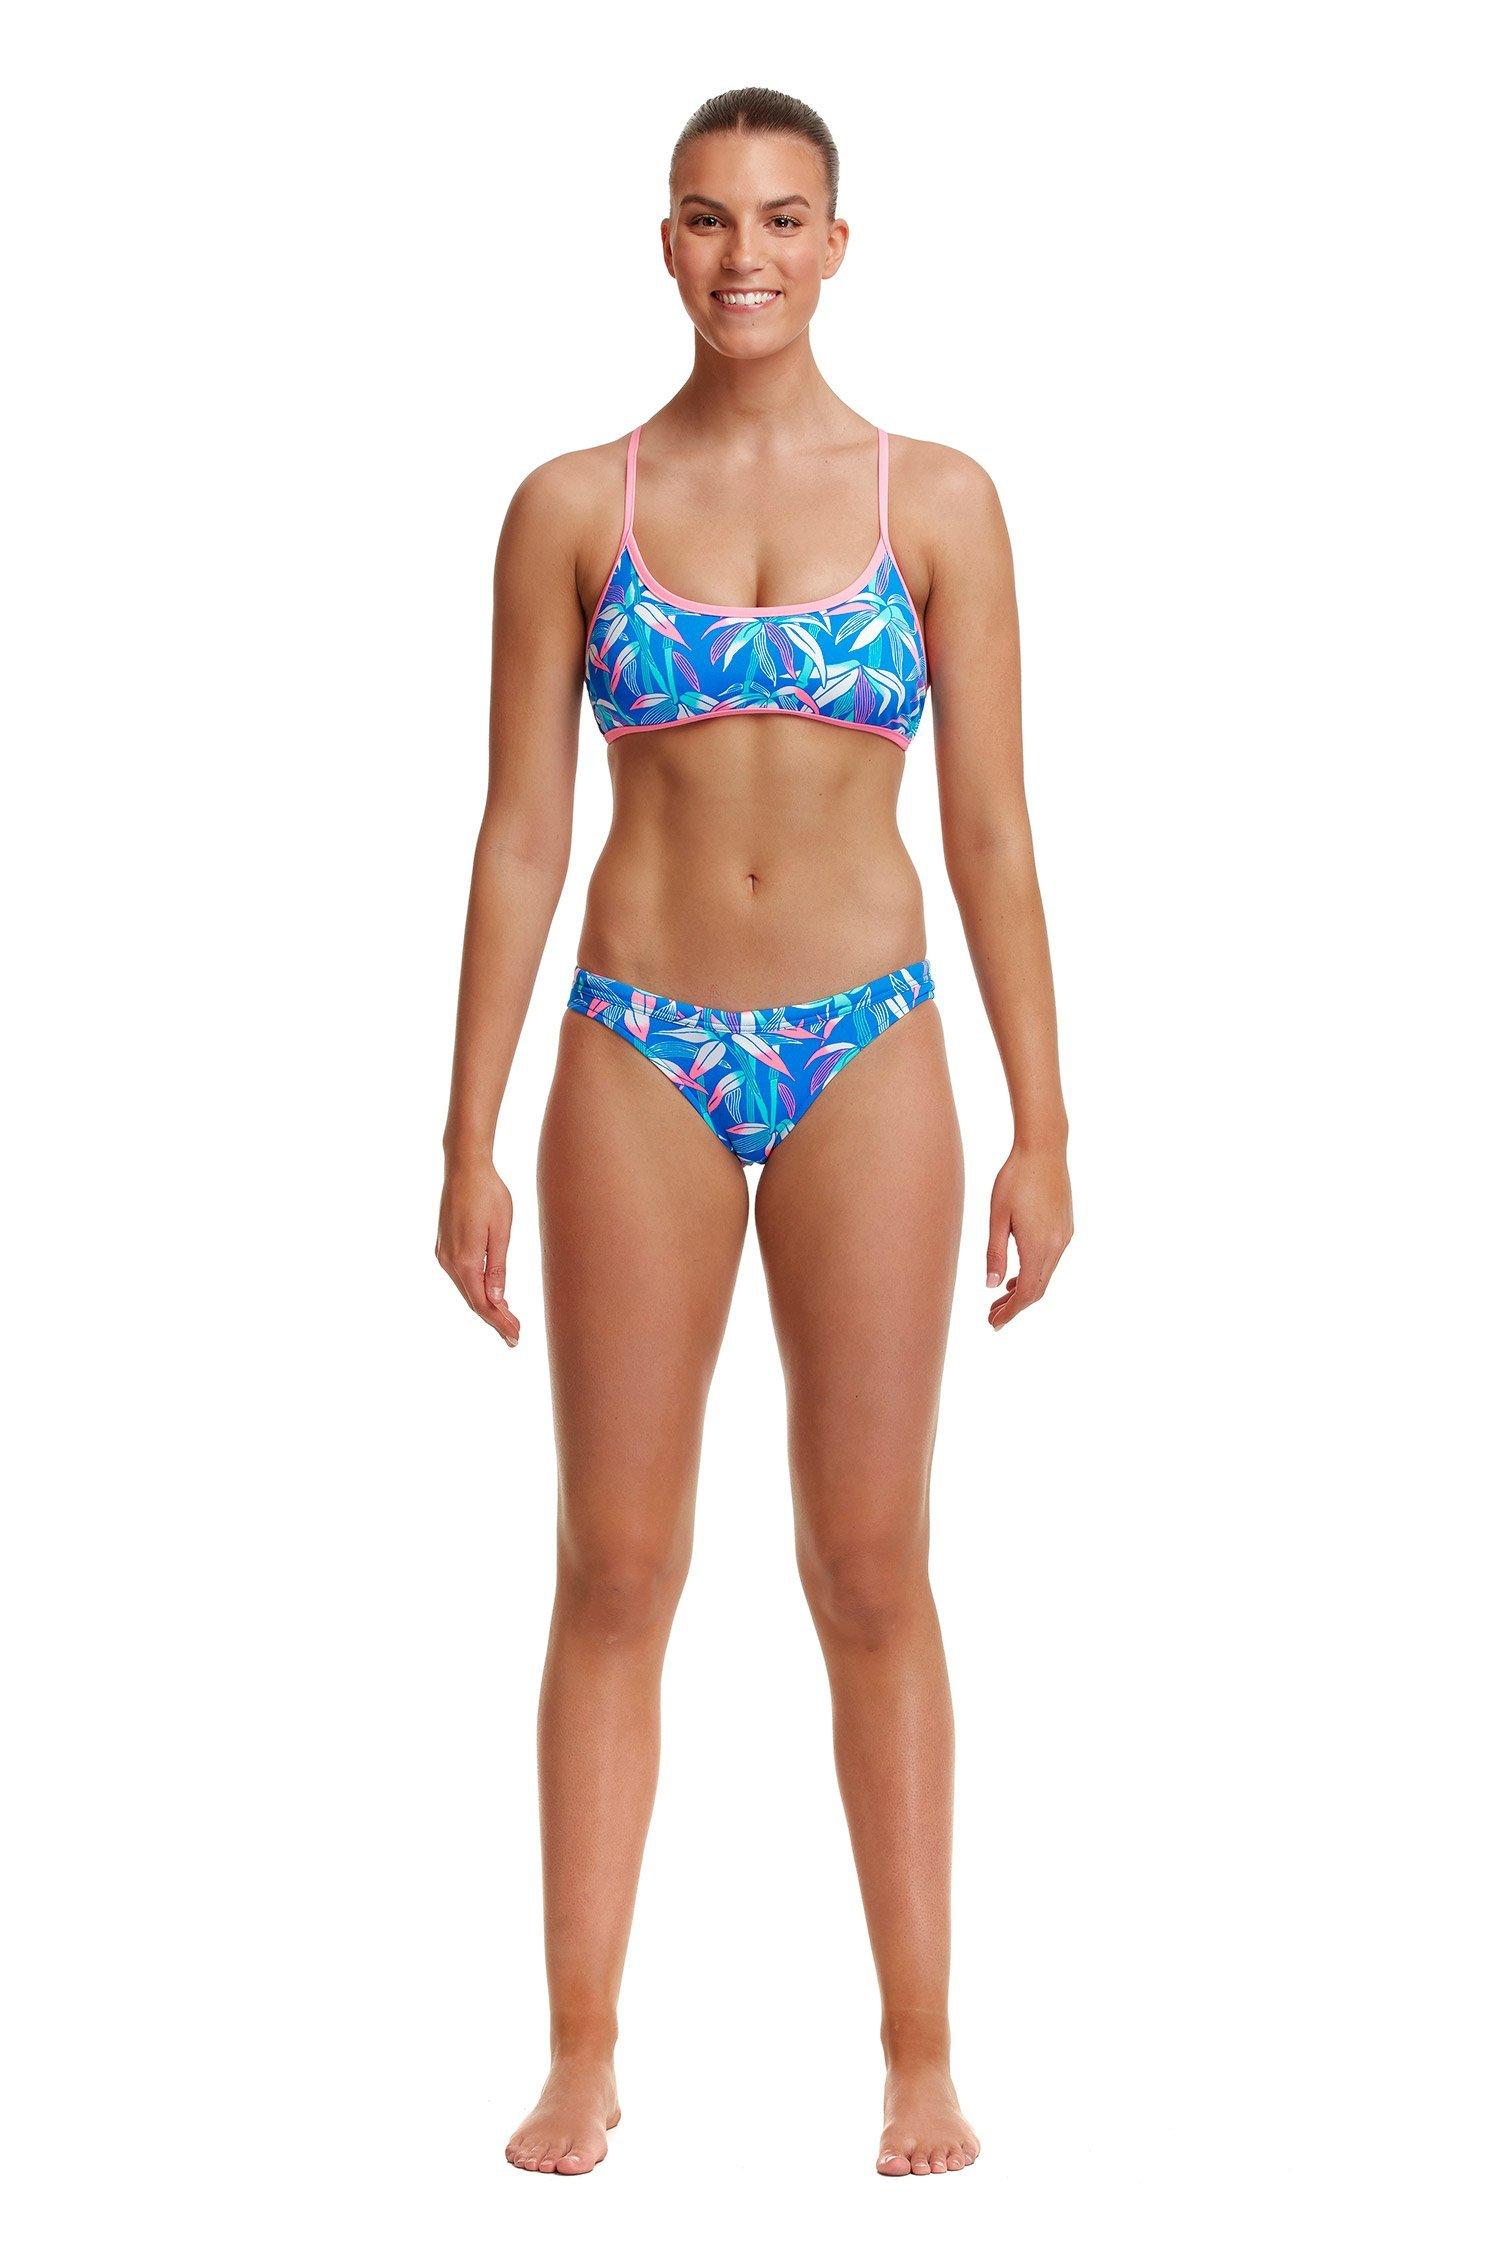 We carry the complete swimwear range from Funkita